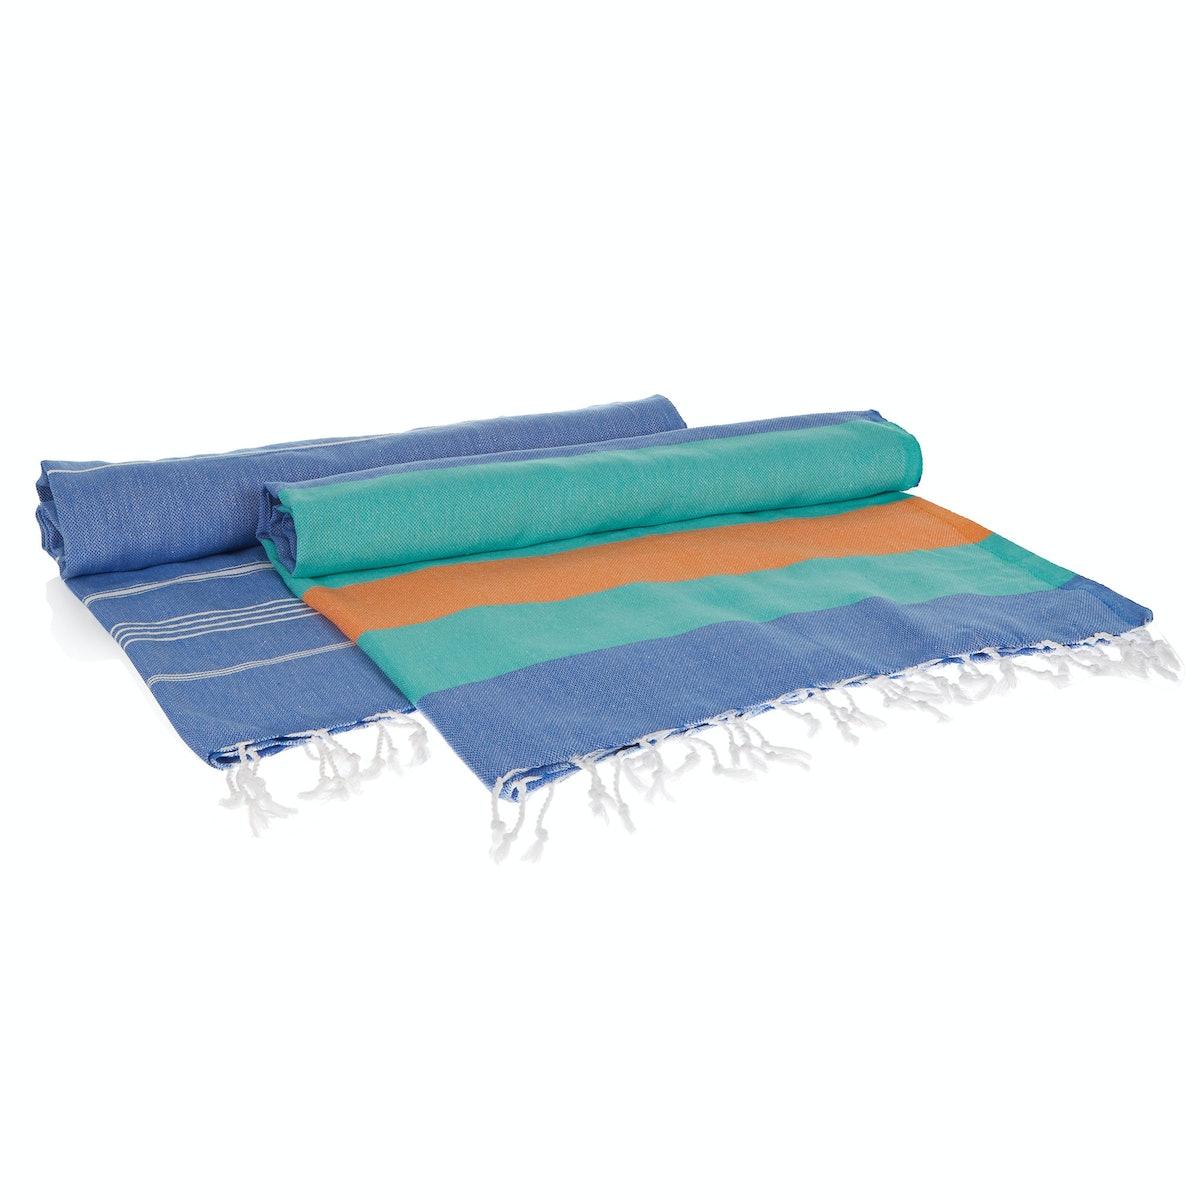 Hammamas towel